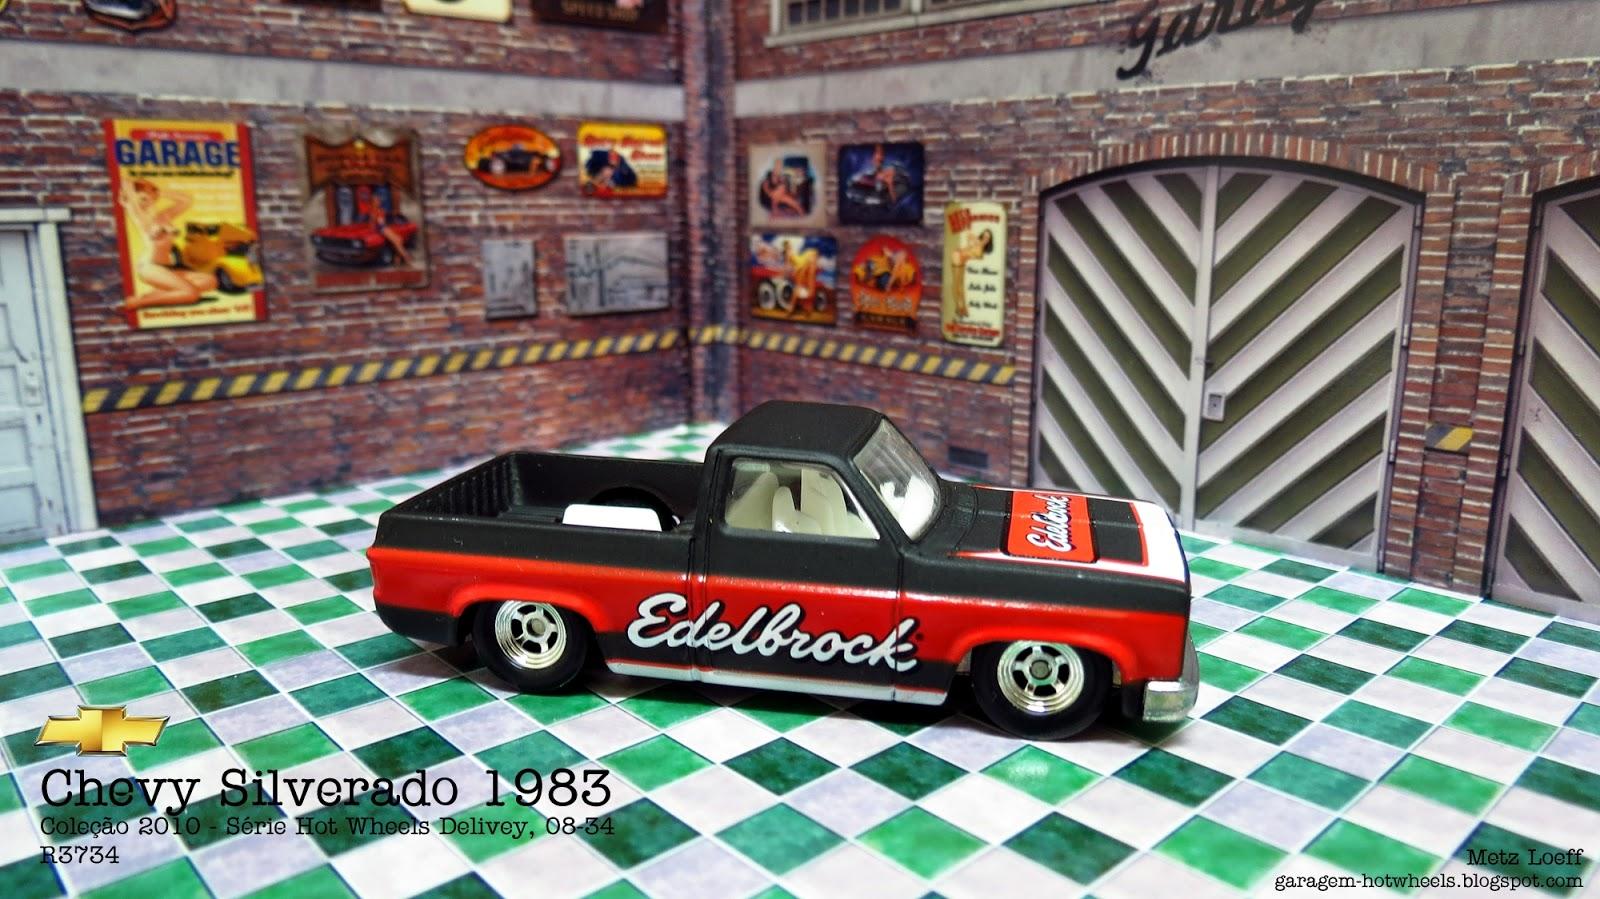 Garagem Hot Wheels Chevy Silverado 1983 C10 Pickup Truck